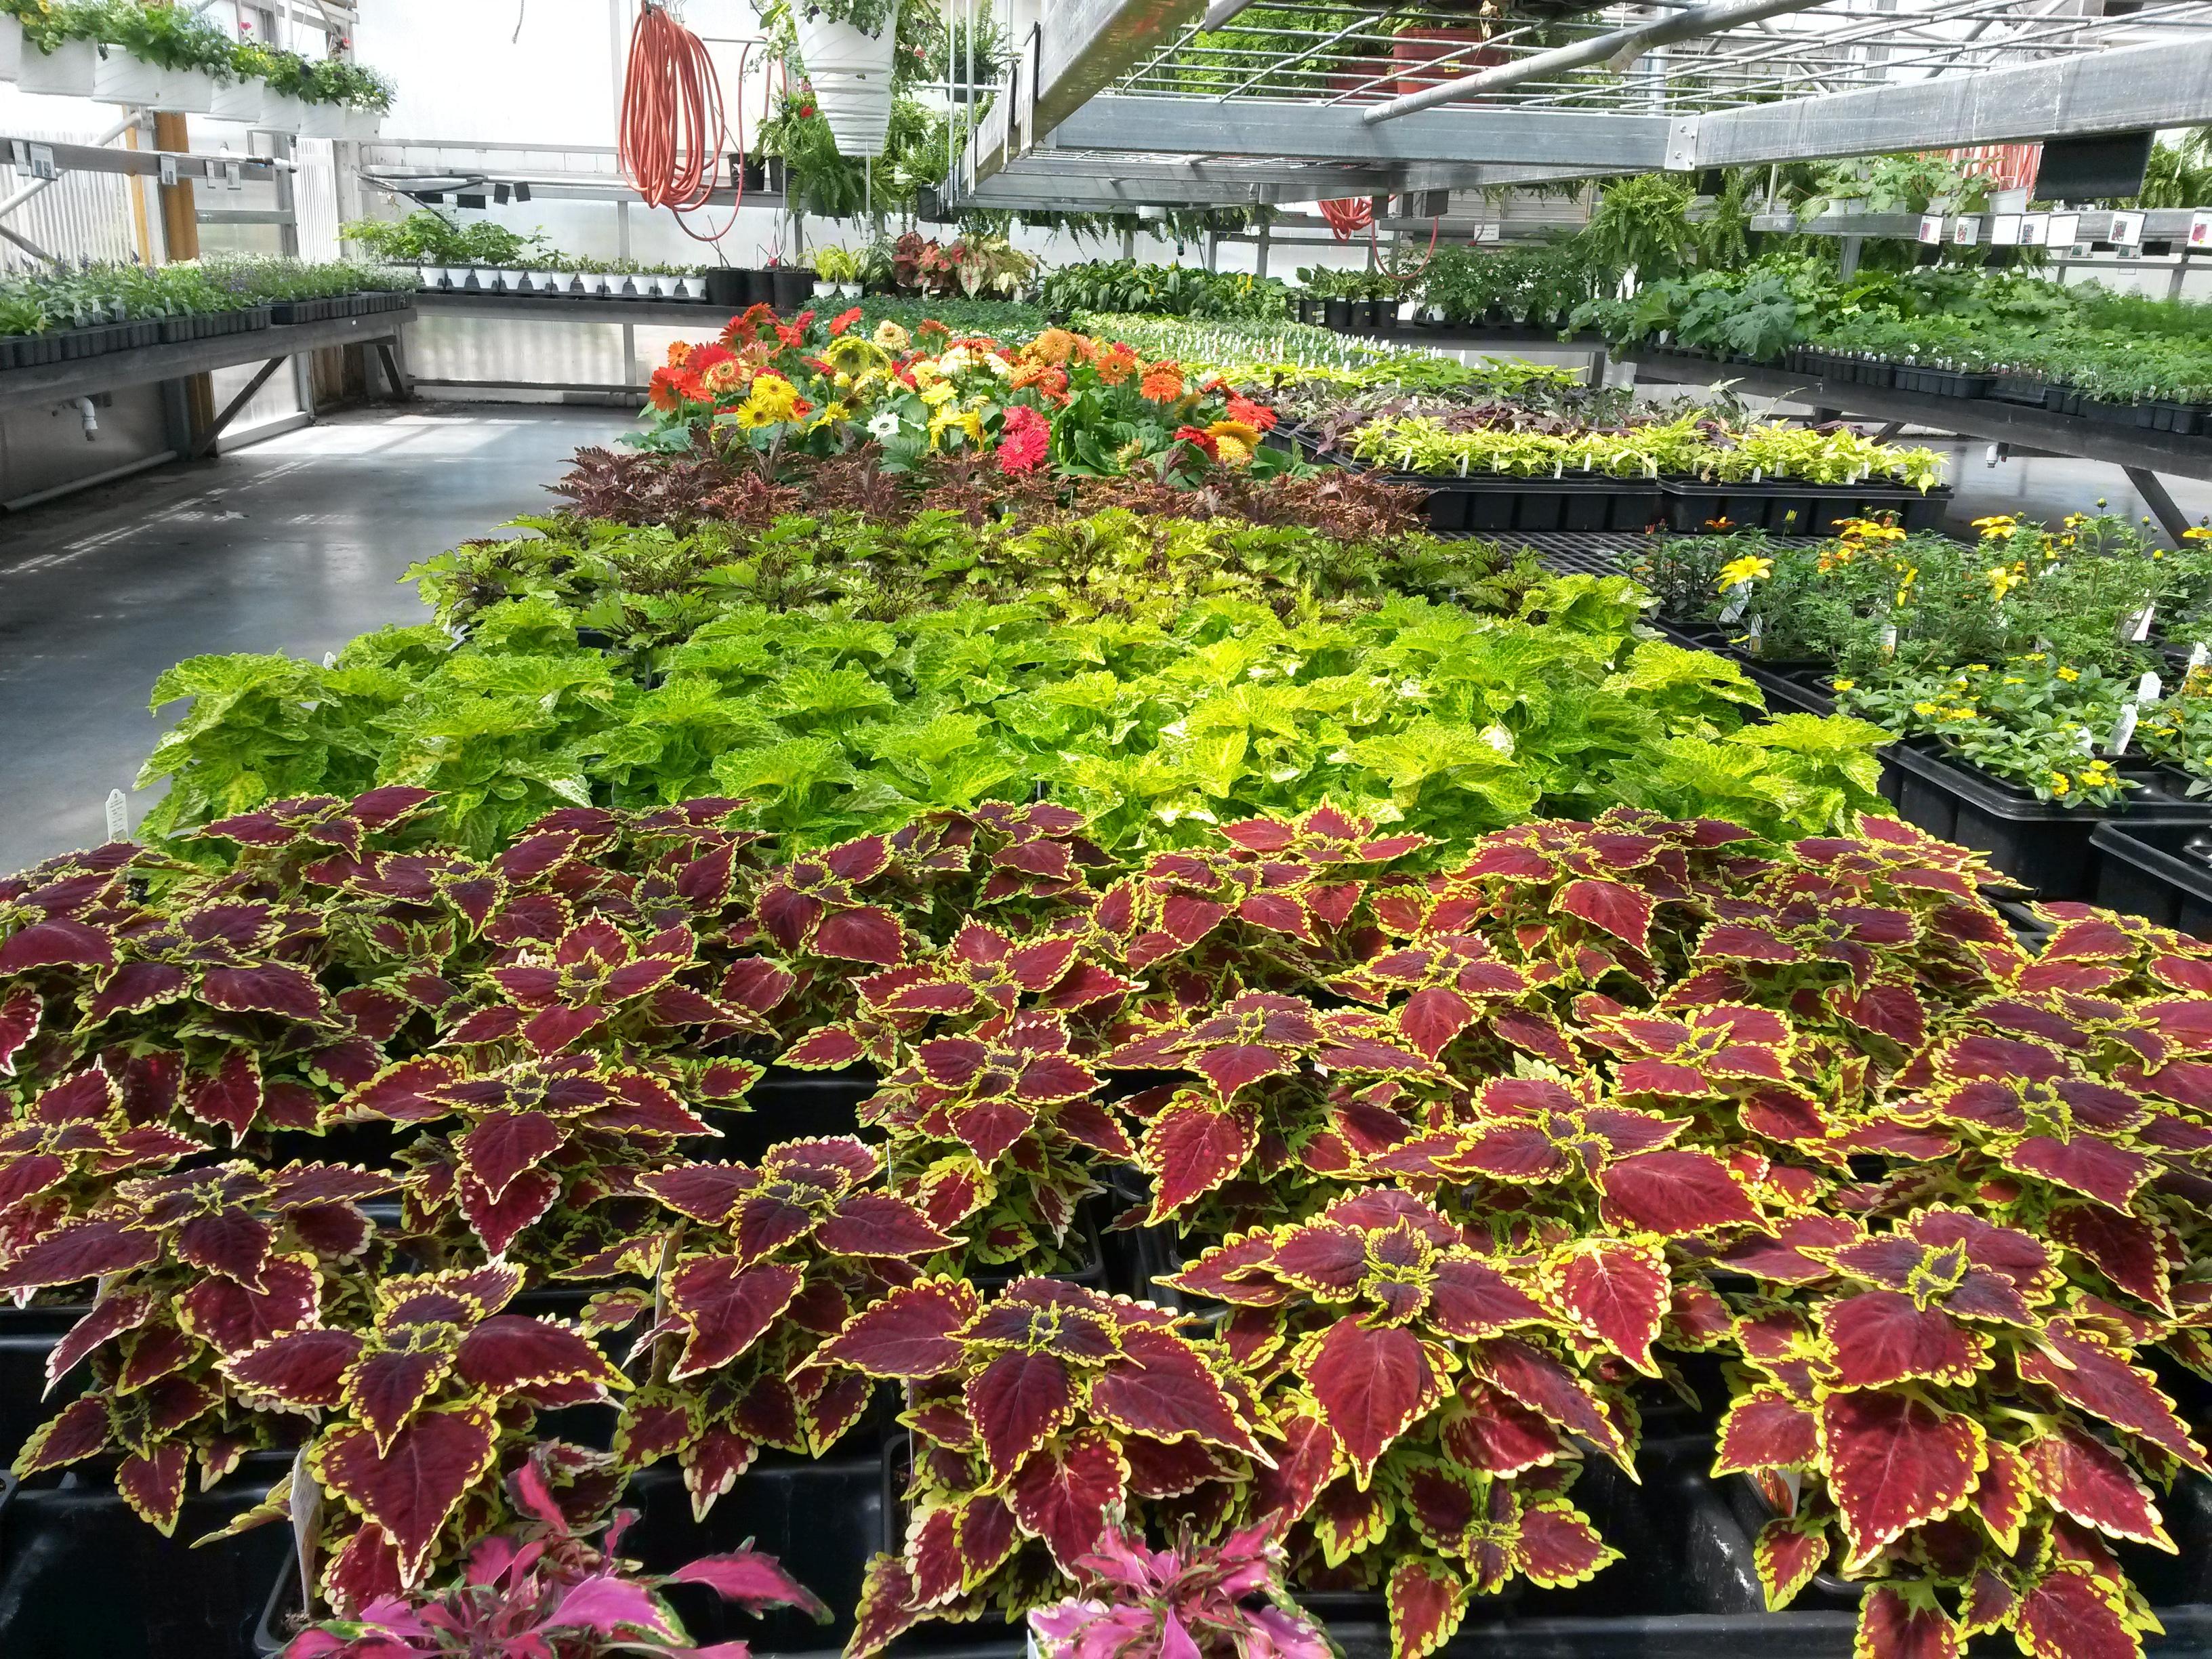 Greenhouse in Butler, MO - Stoplight Market